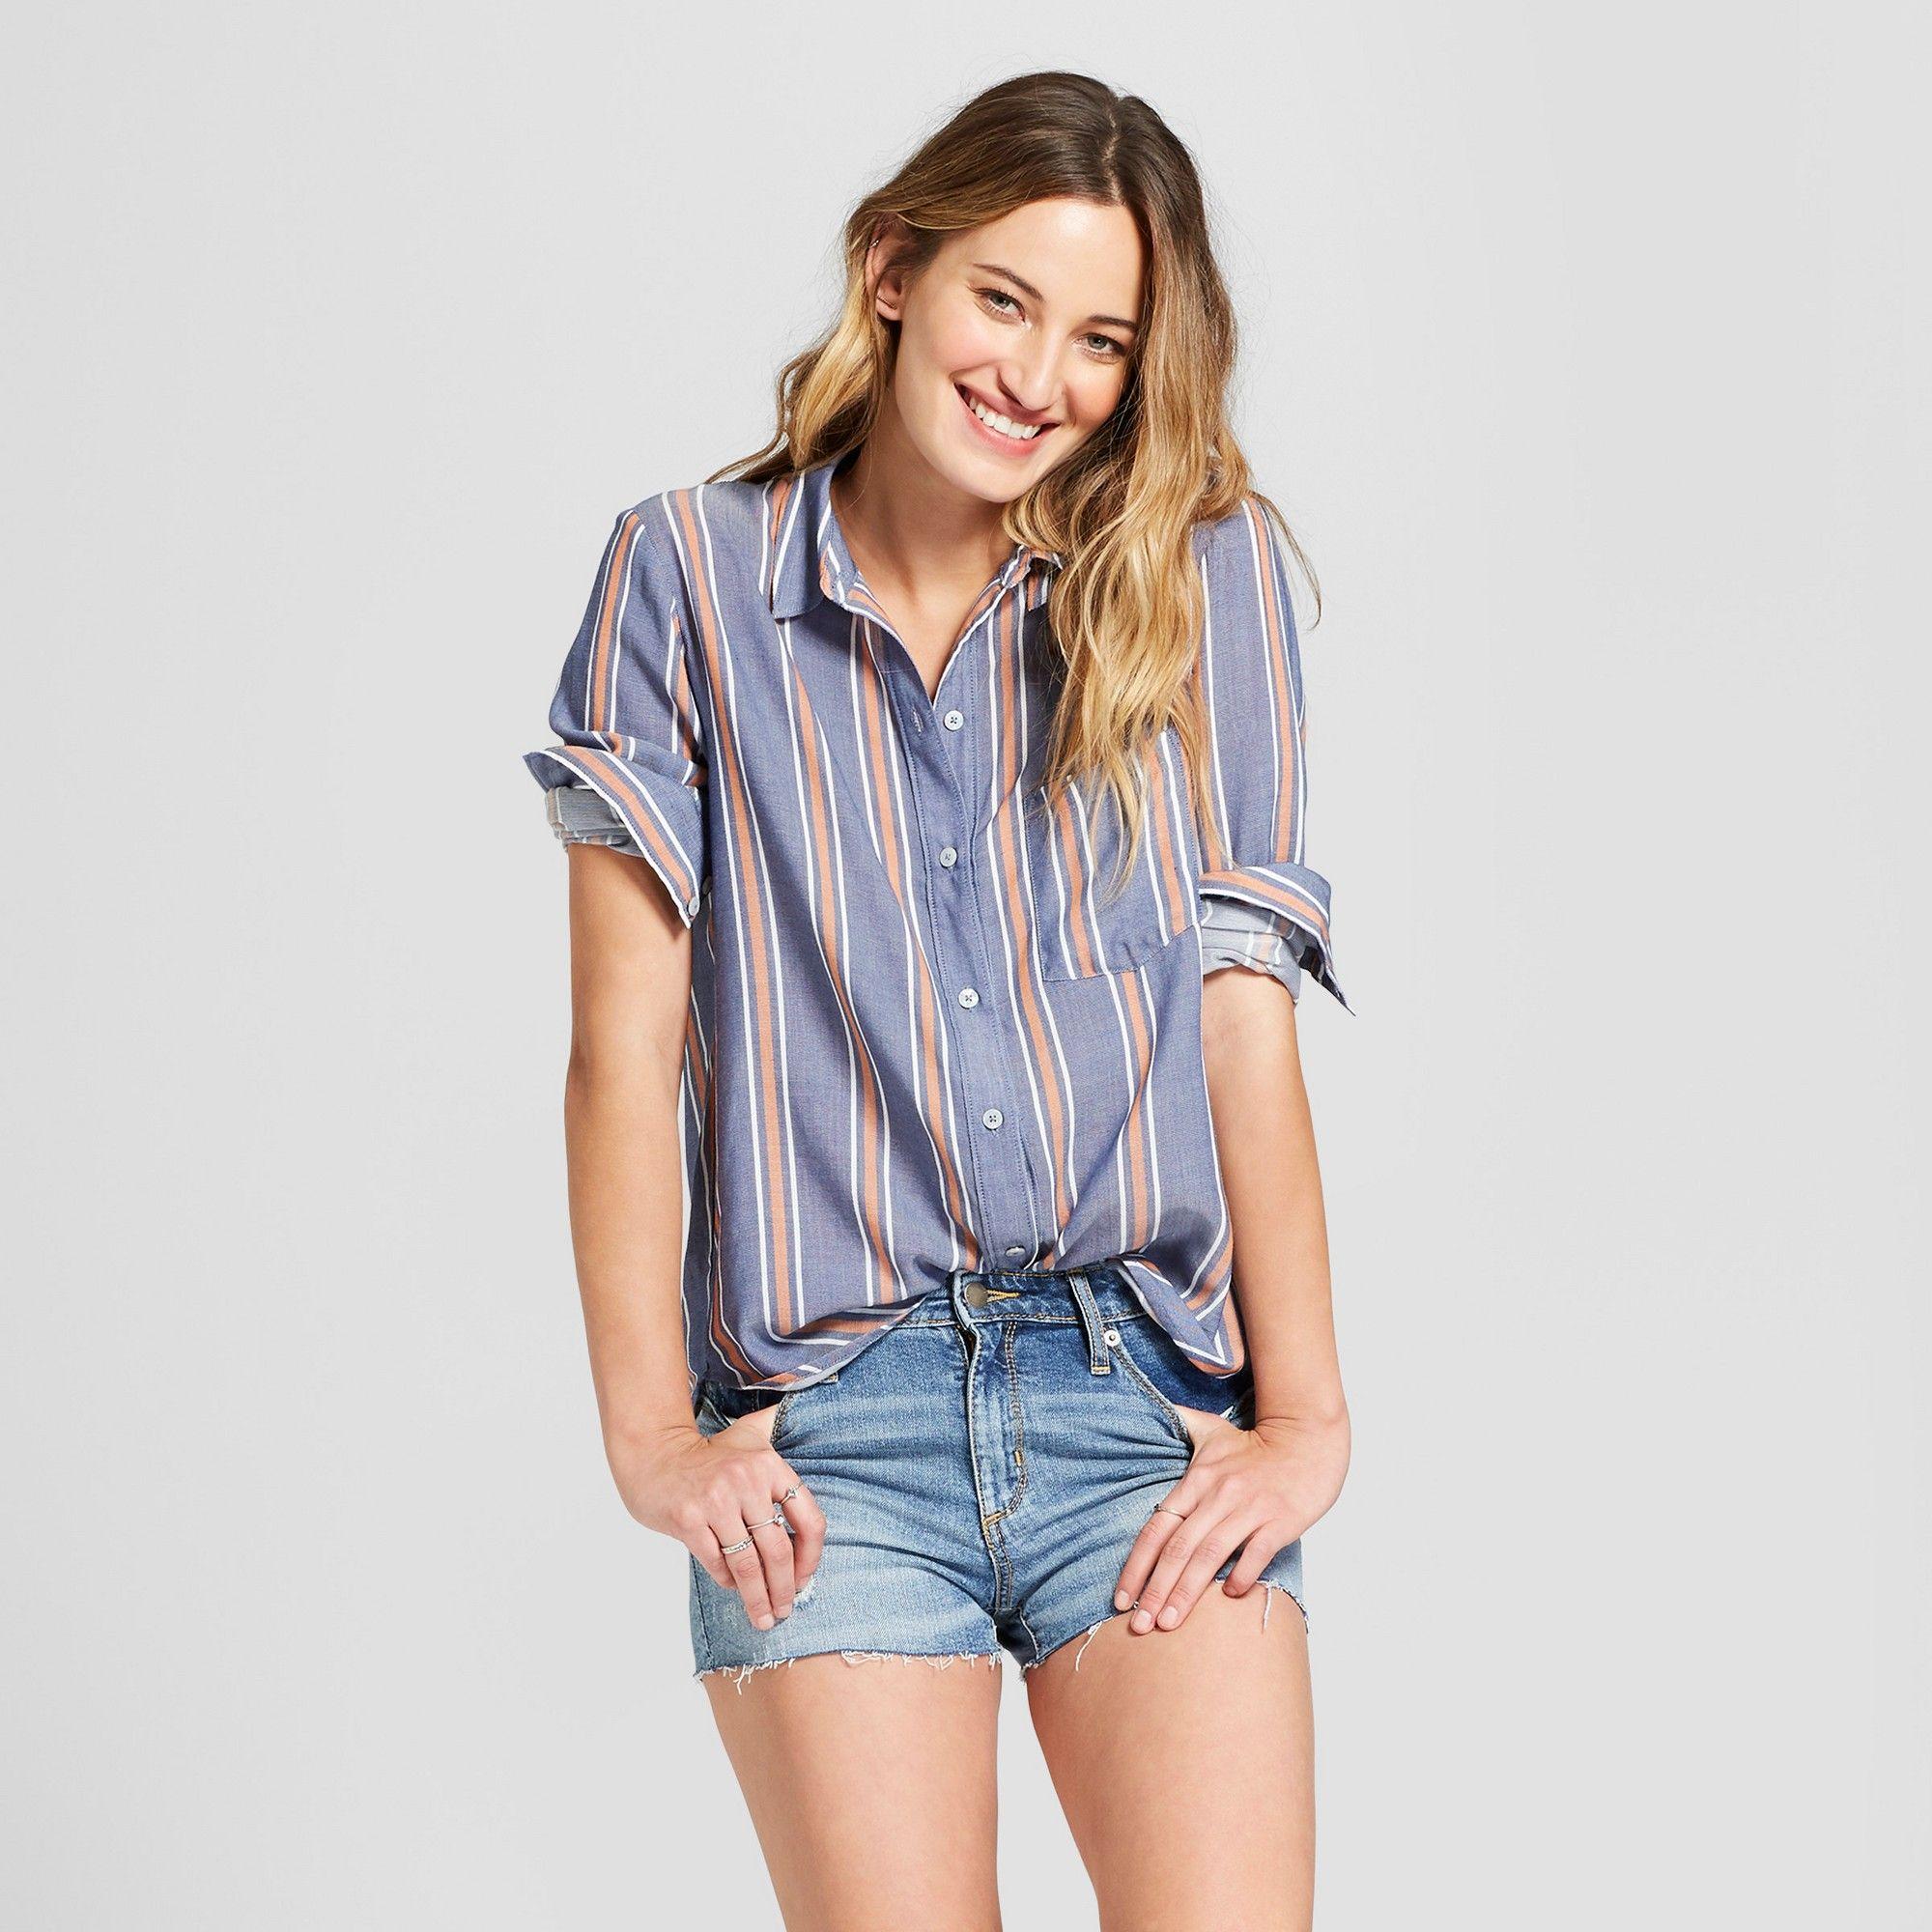 5a1cf5ec898 Women s Long Sleeve Striped Button-Down Shirt - Universal Thread Blue XL